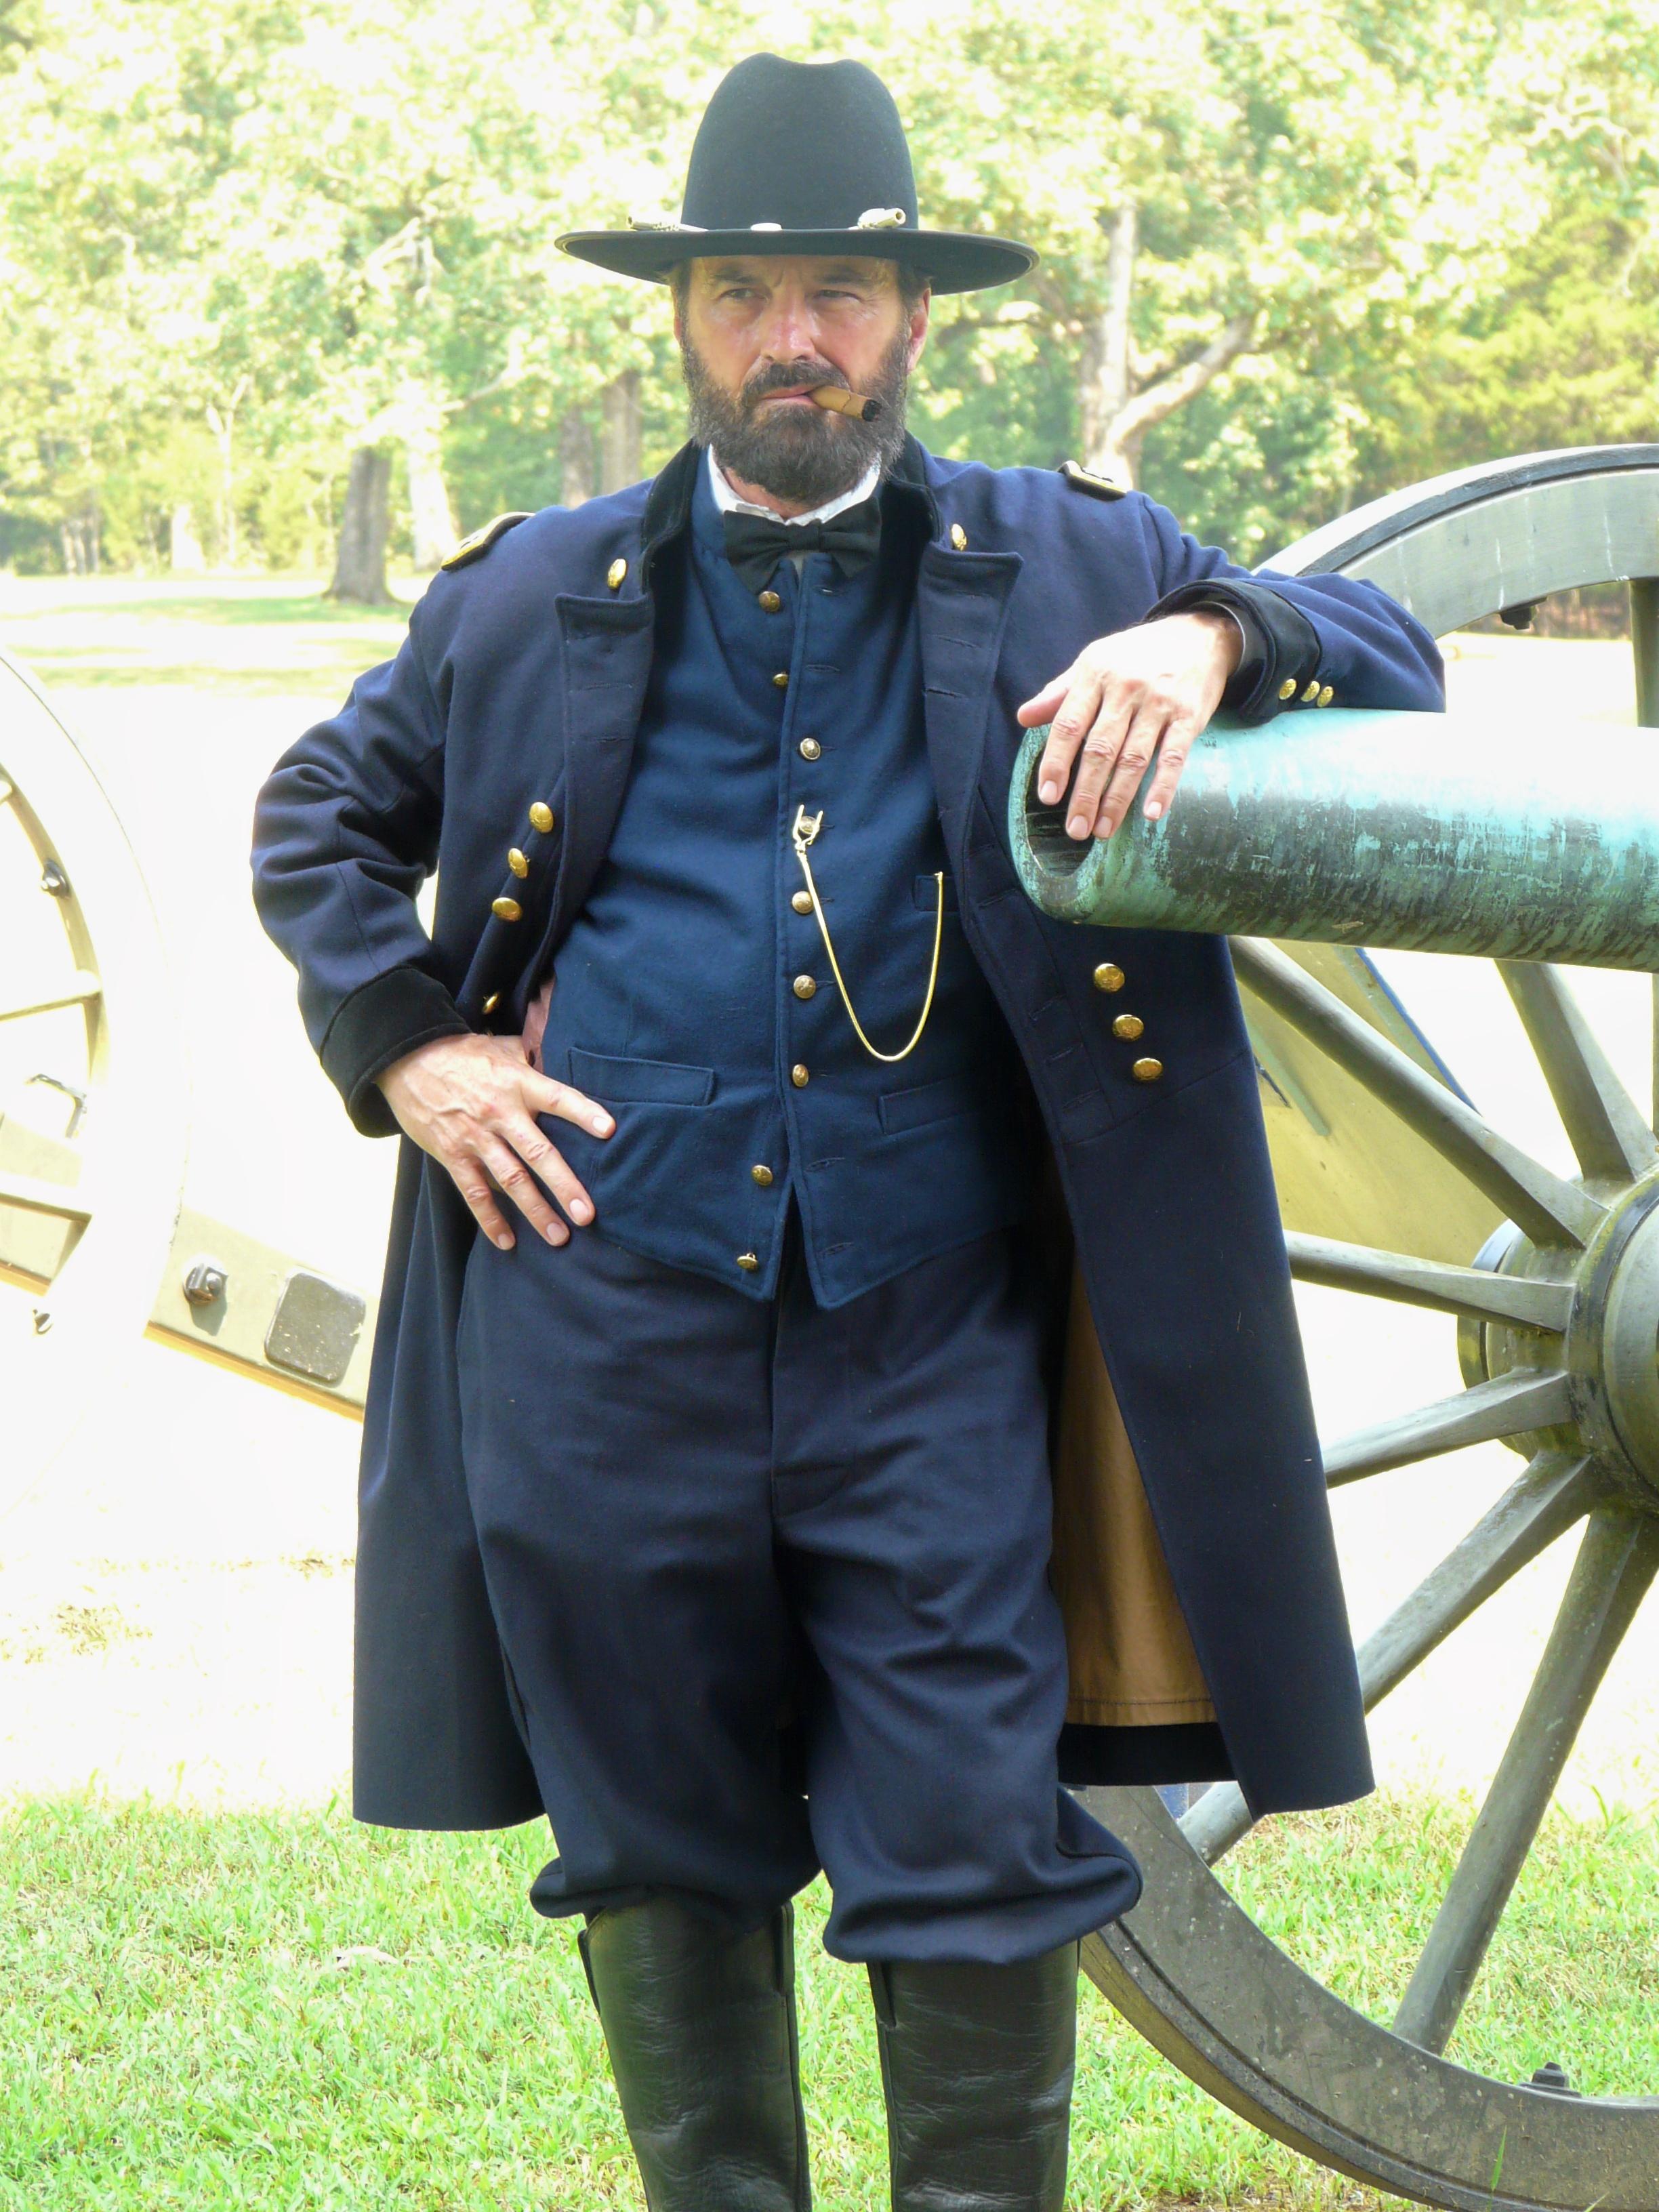 Shiloh, Grant in front of gun